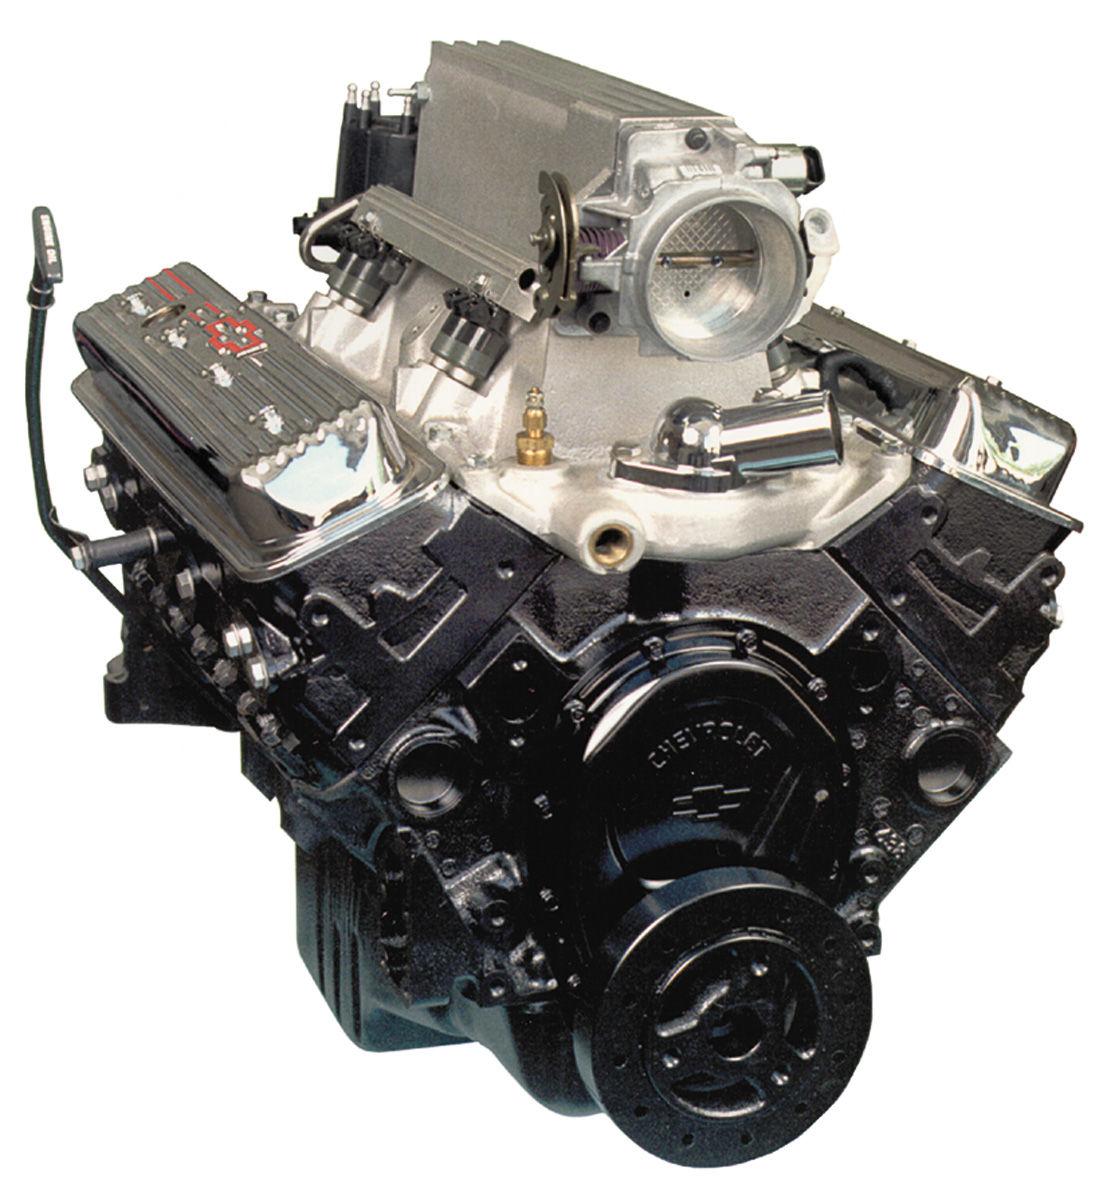 Photo of Regal Engine, Ram Jet 350 (Complete)